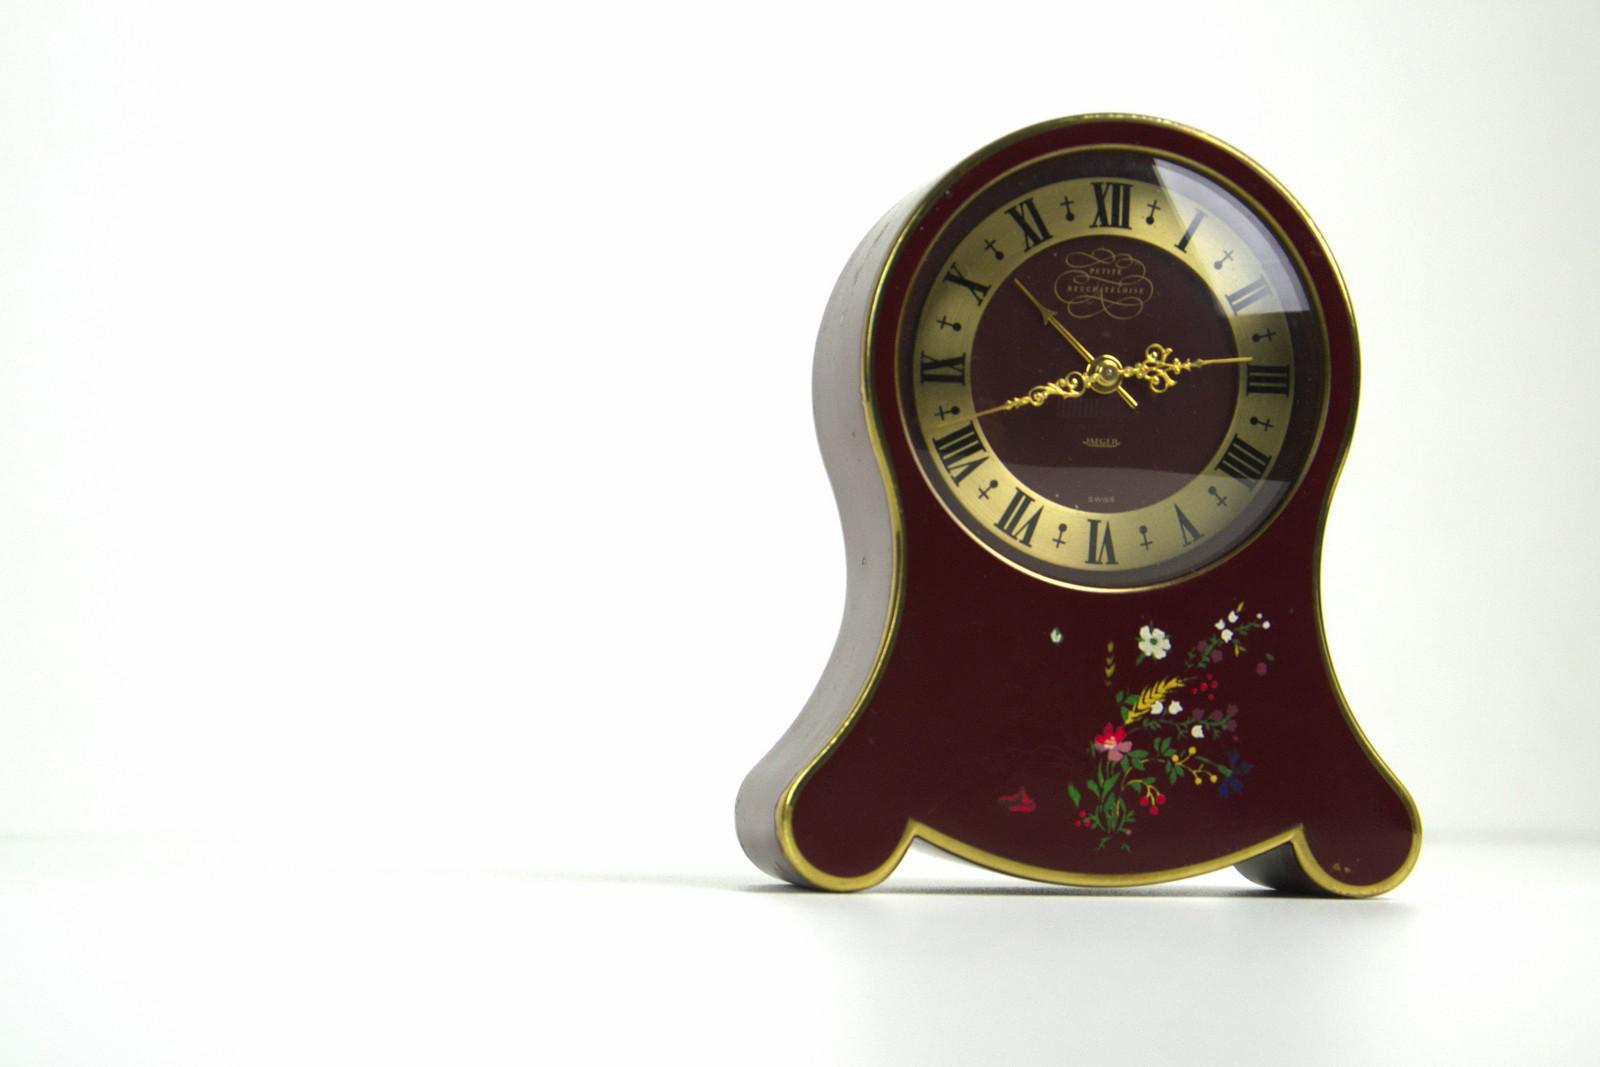 jaeger-petit-neuchteloise-orologio-sveglia-da-tavolo-2,3321.jpg?WebbinsCacheCounter=1